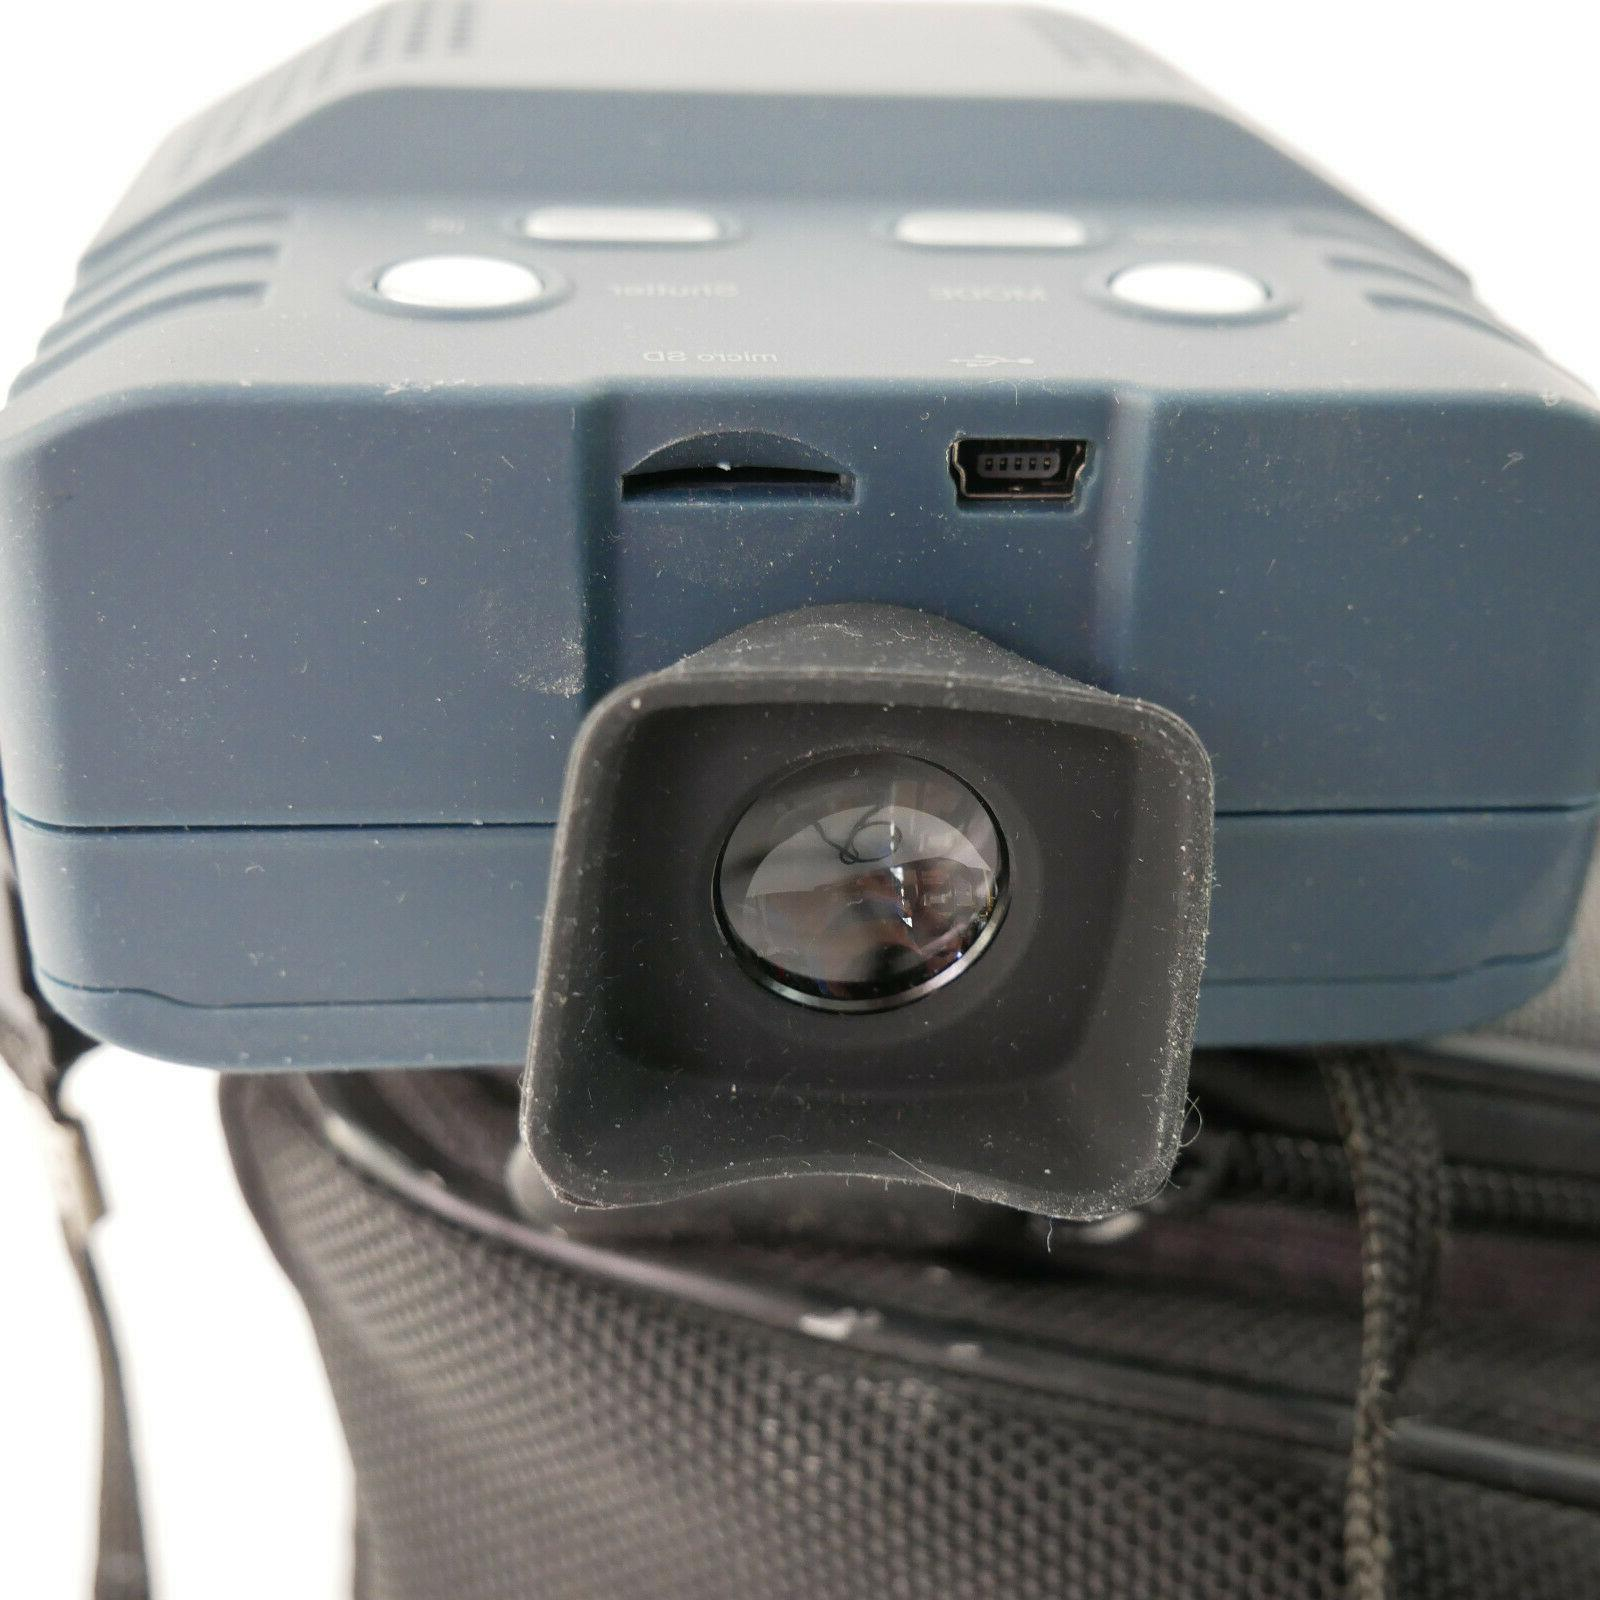 2X Camera Carrying Bag